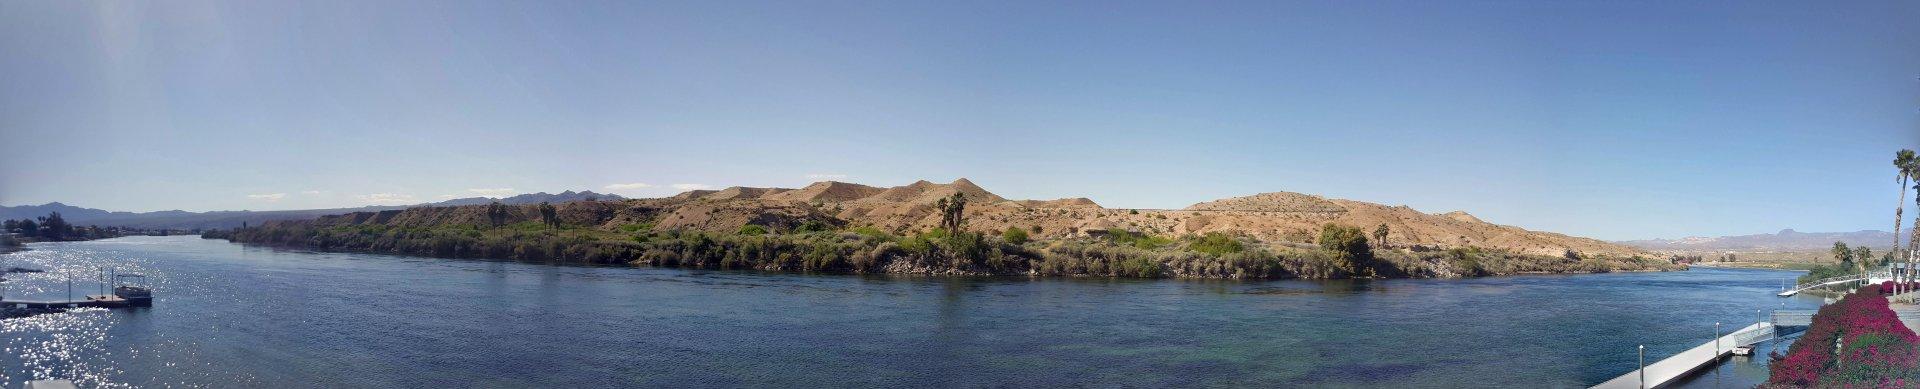 River Bullhead.jpg